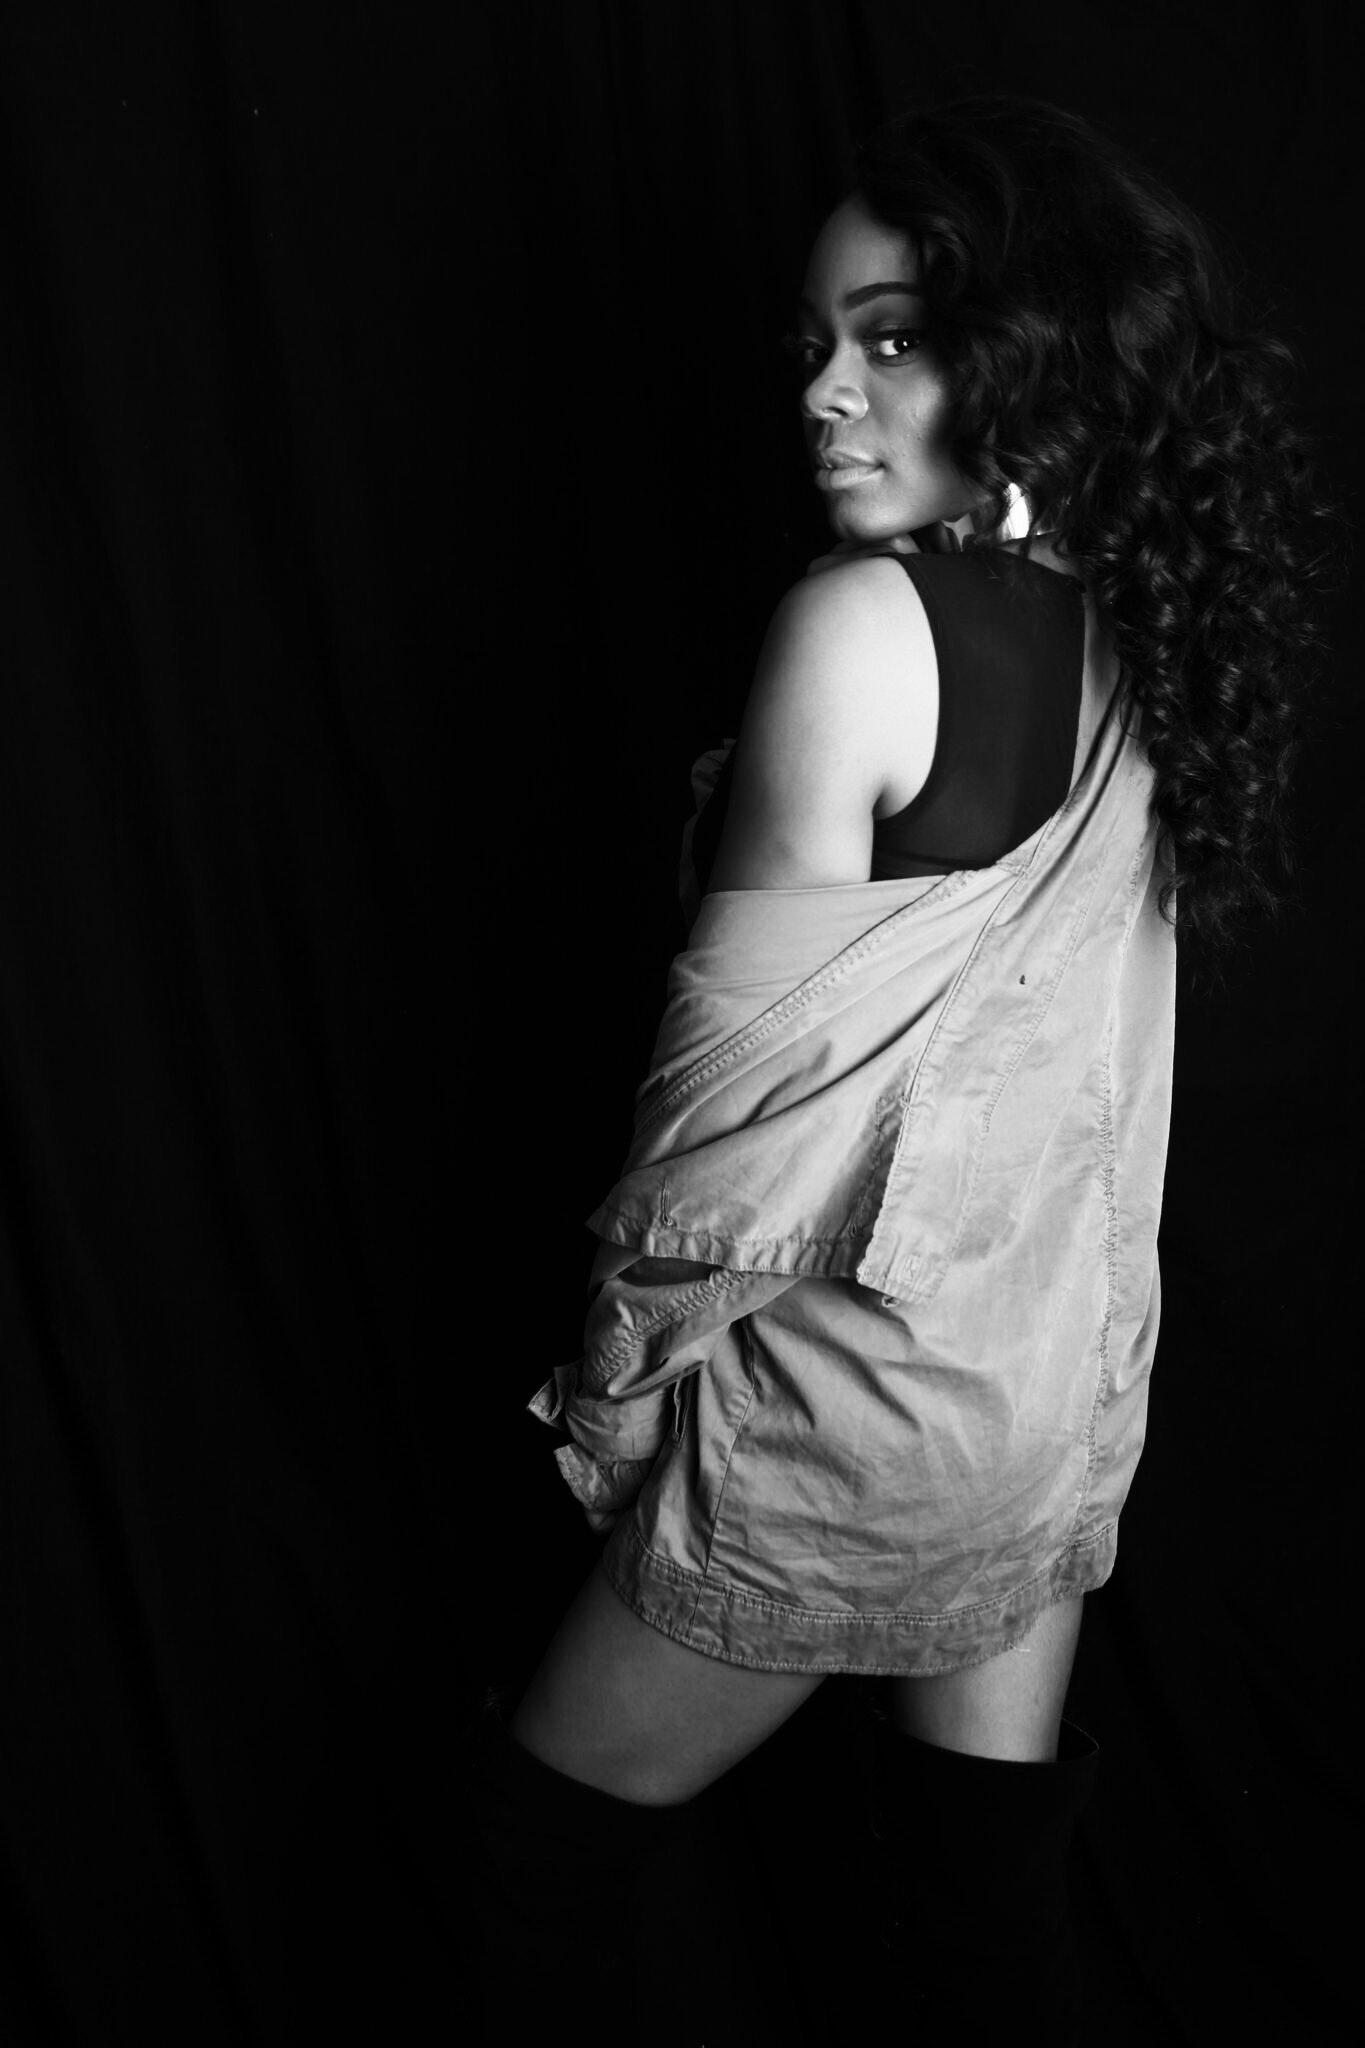 Sarah cherisien's Model portfolio